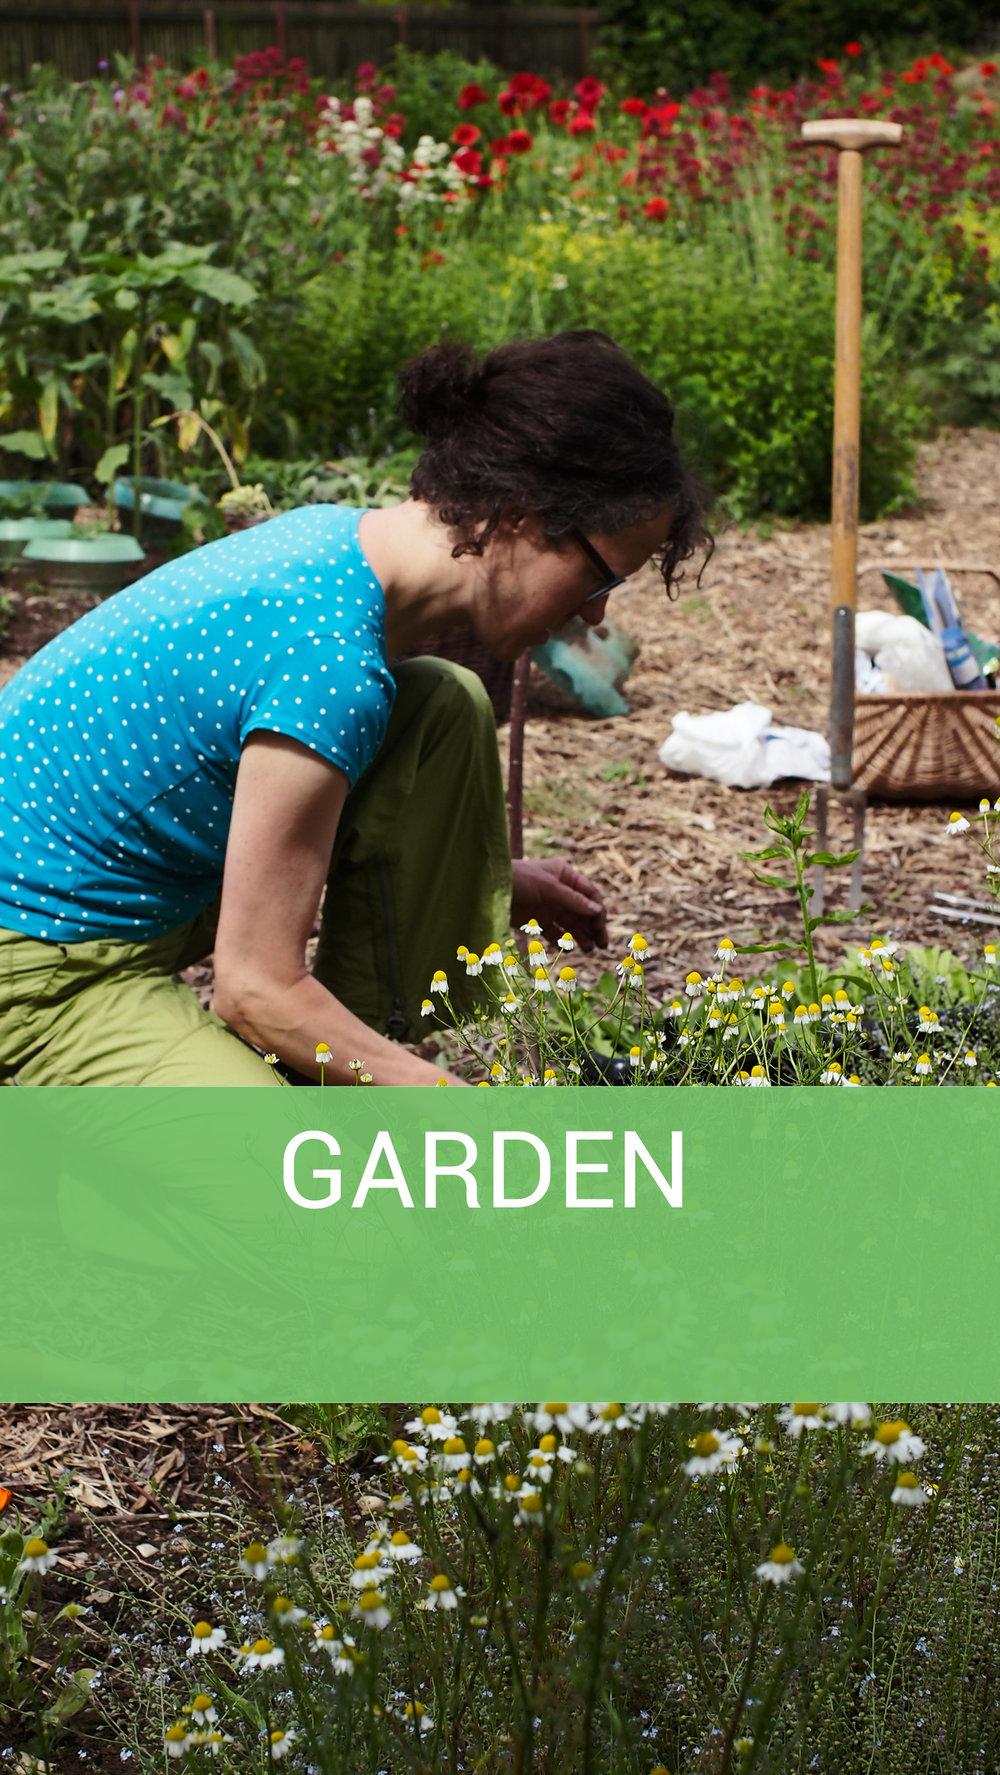 Garden2_LandguetRied.jpg